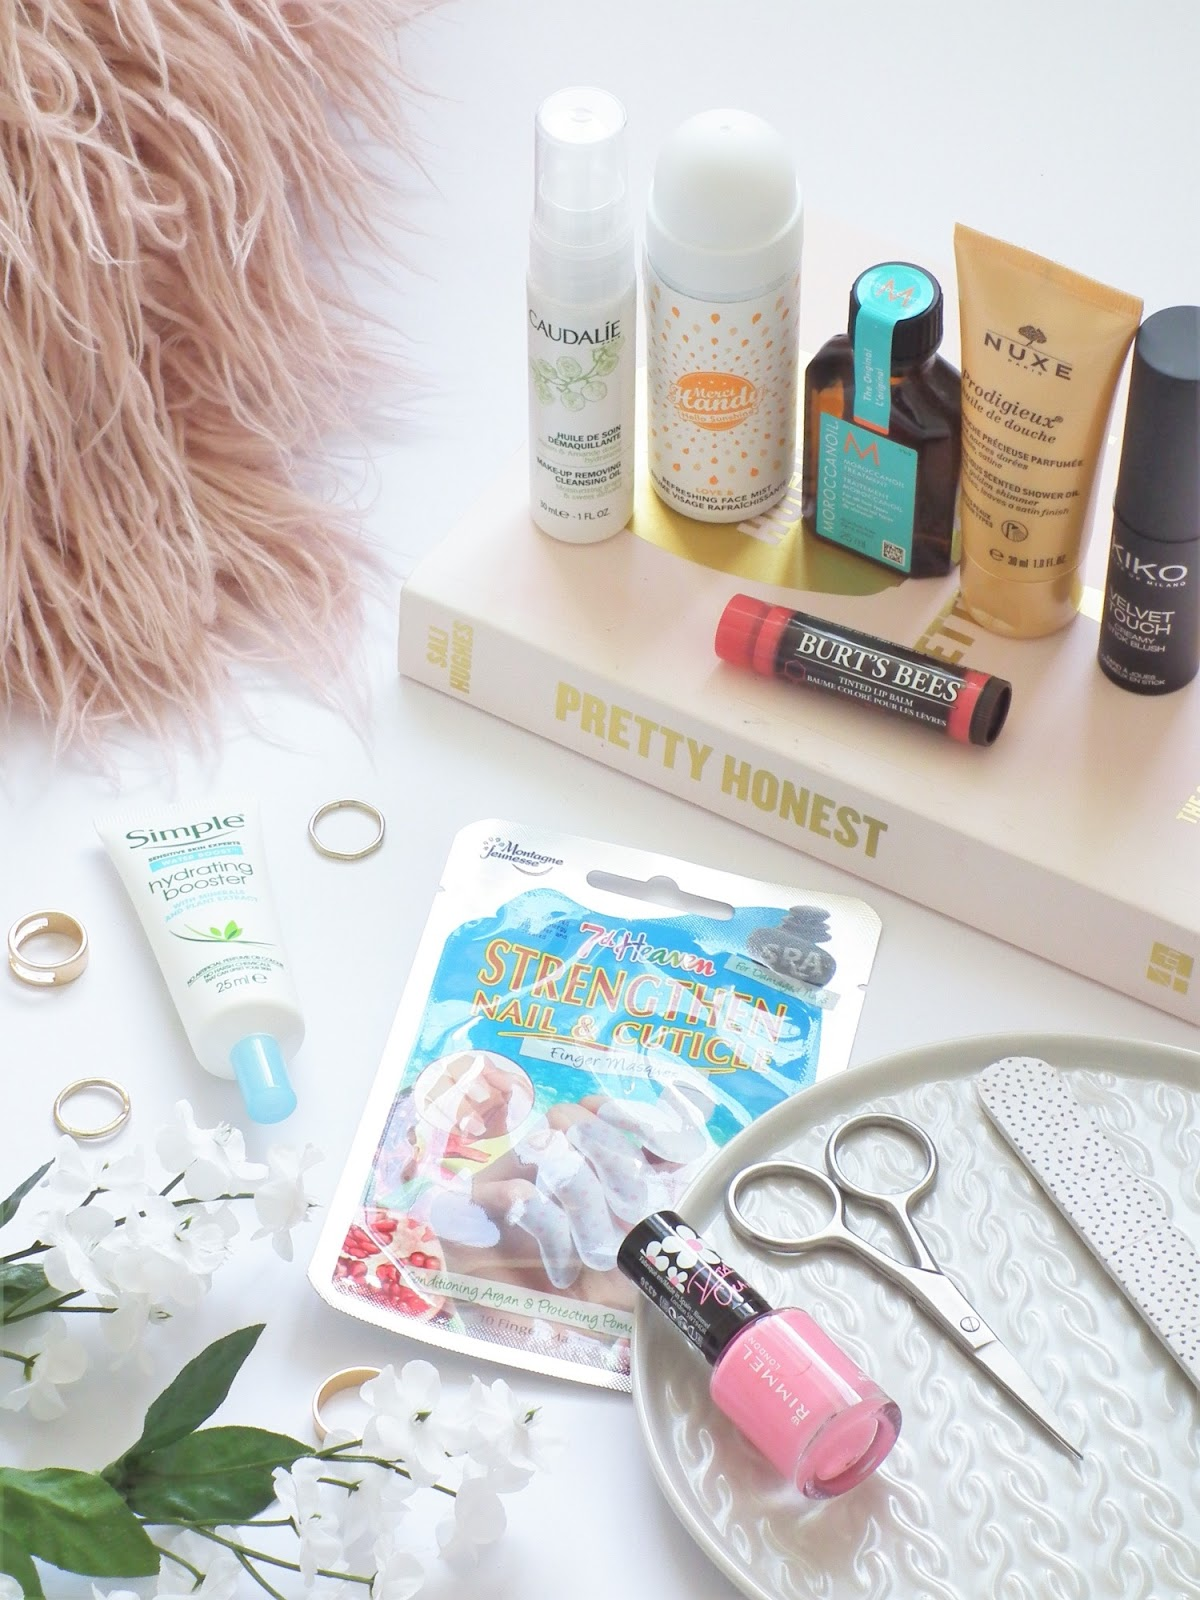 Latest In Beauty - Beauty Guru Box* | First Impressions